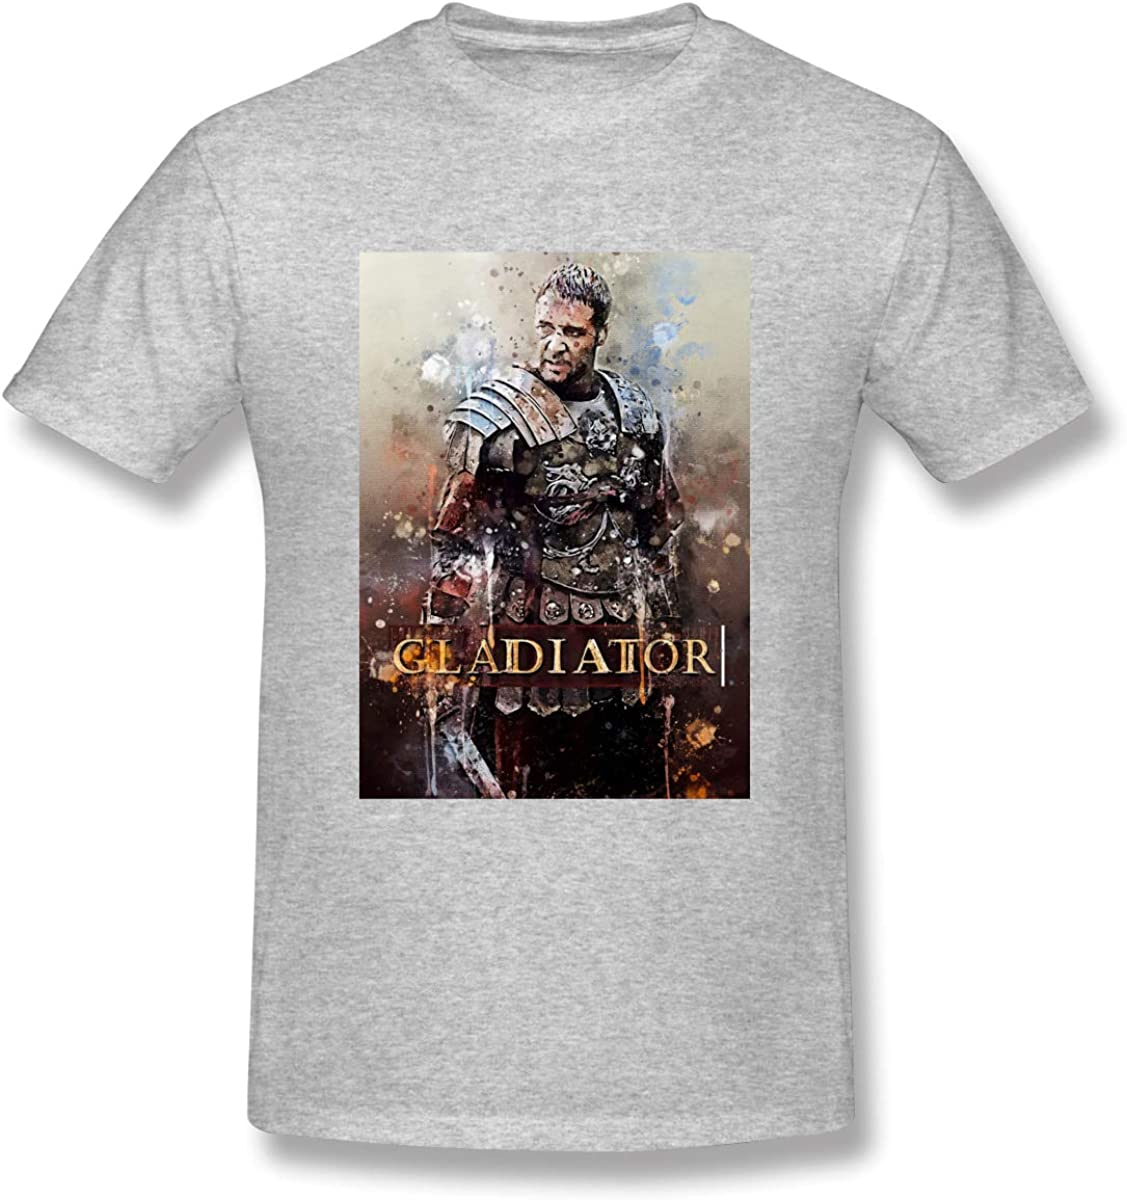 Shawnajjarosz Gladiator Gray Vogue Short Sleeve Graphic T-shirt